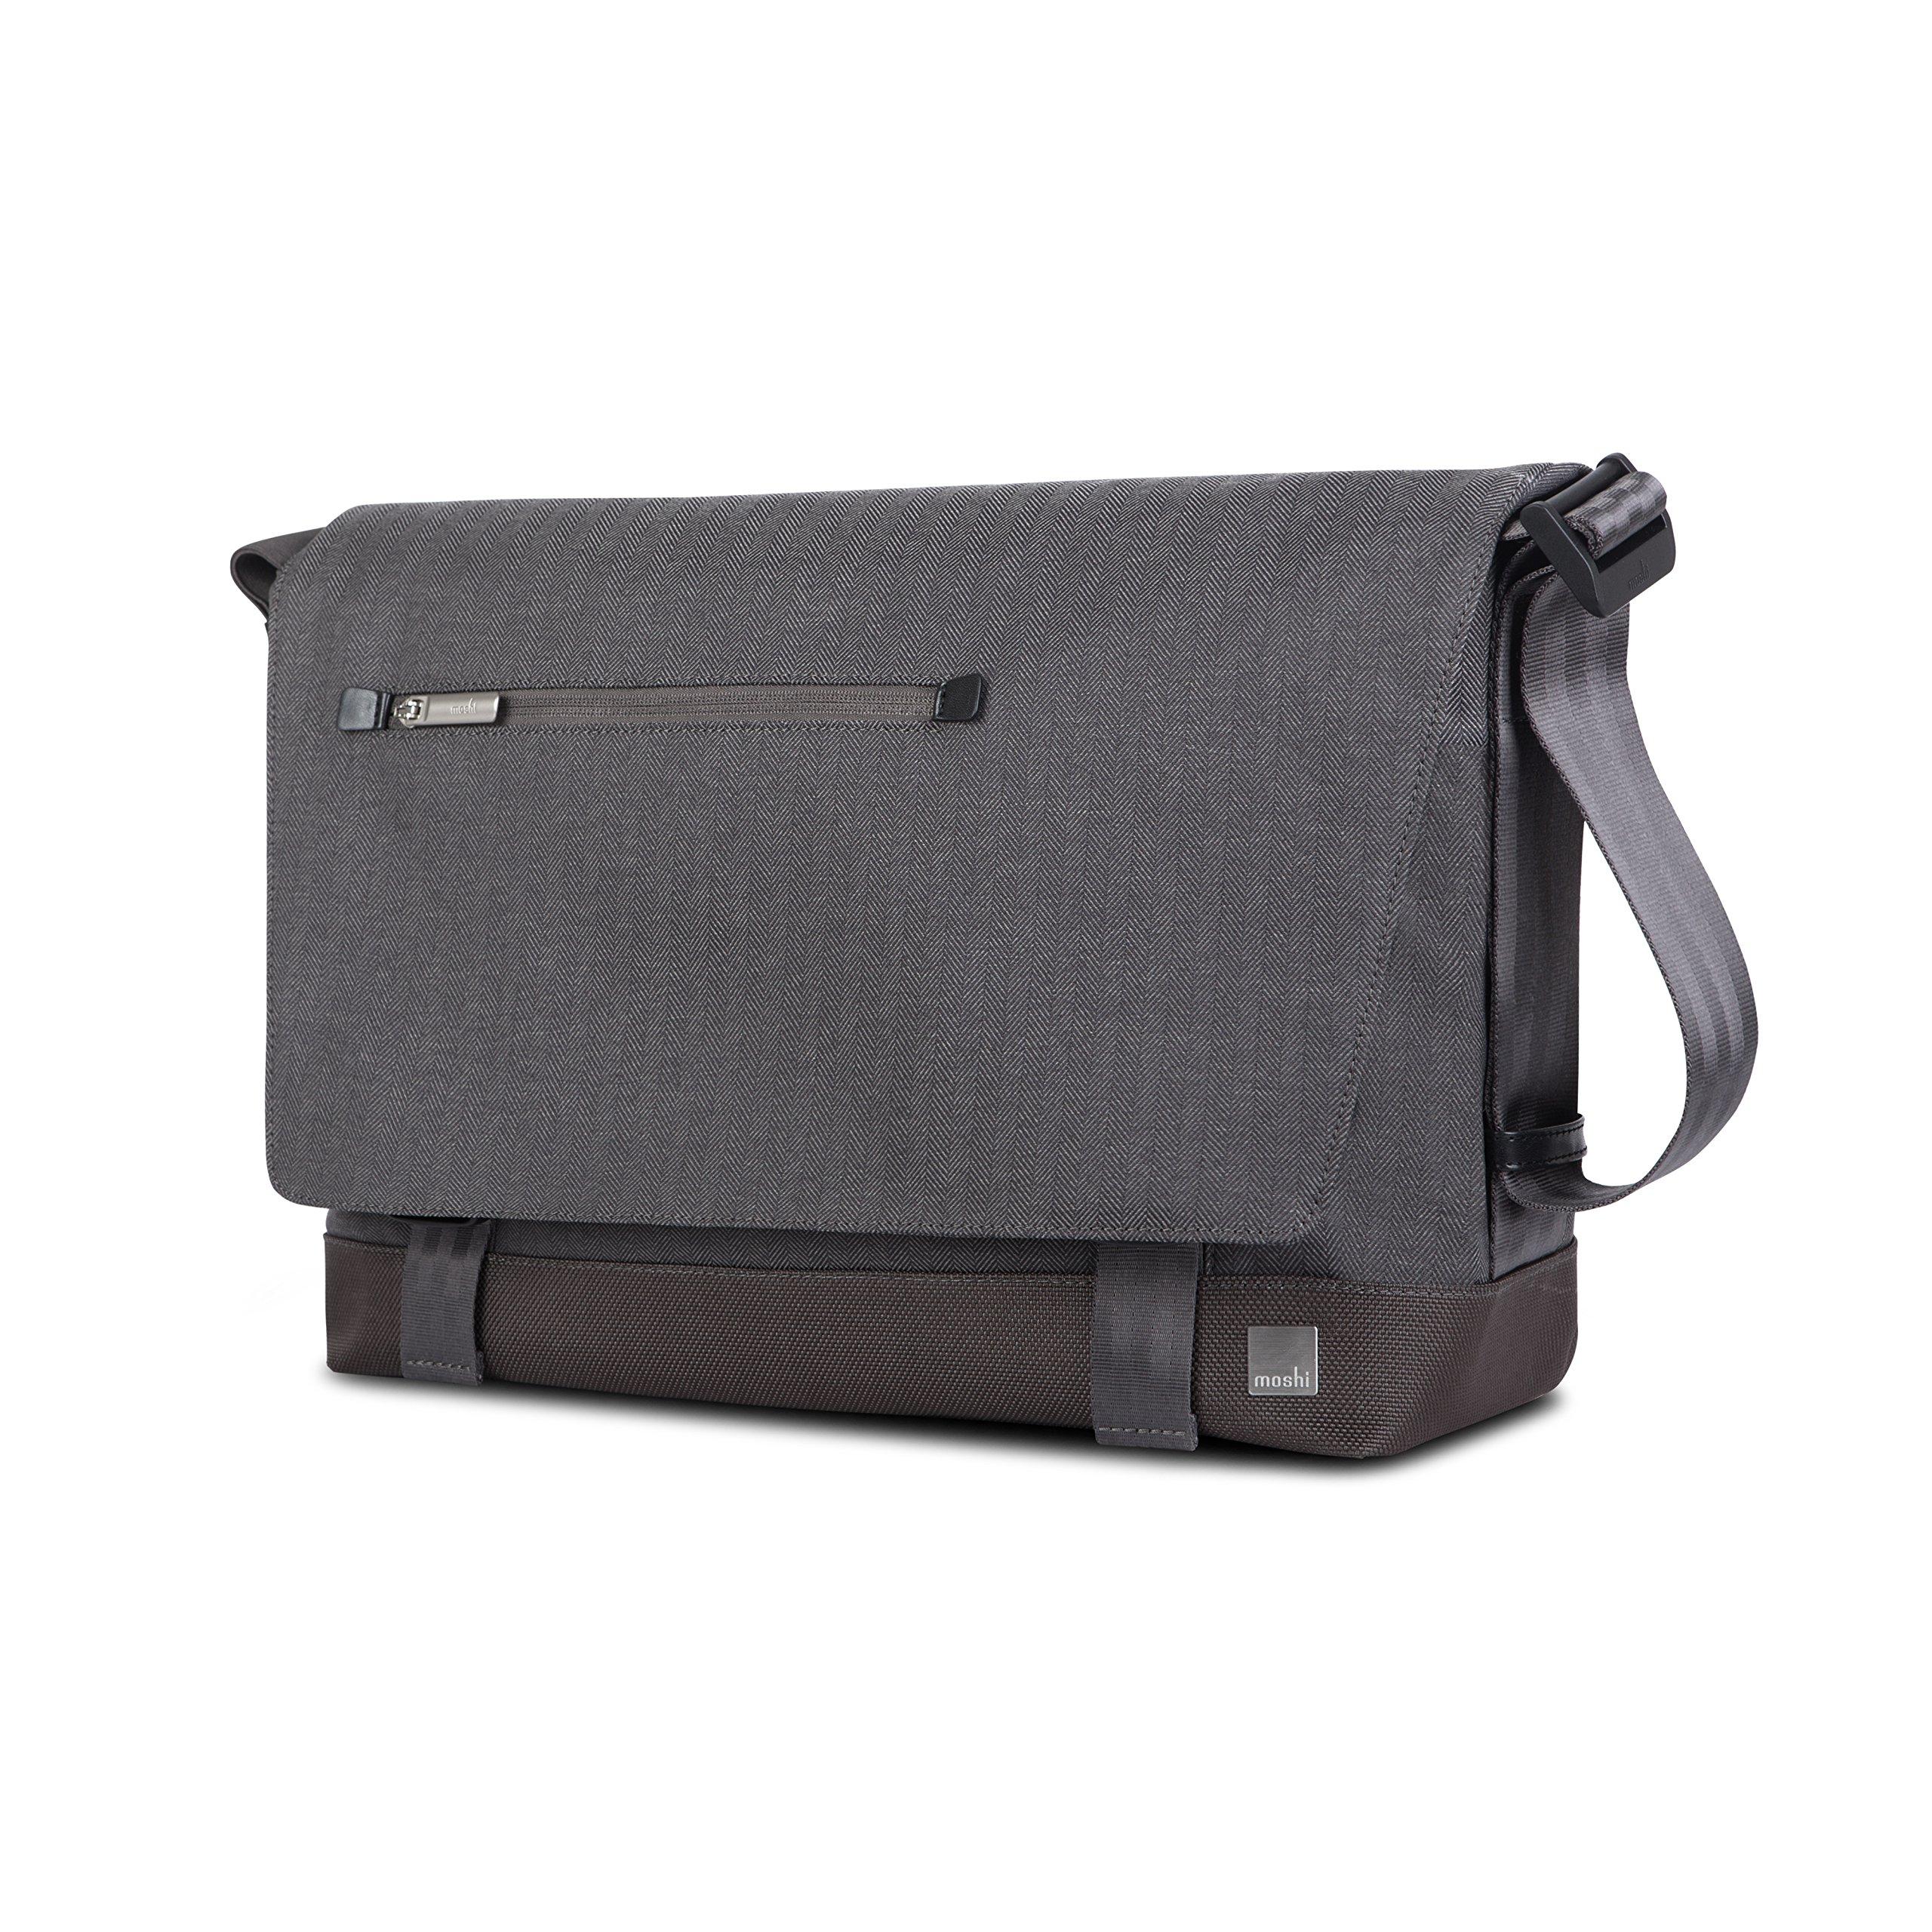 Moshi Aerio Messenger Bag (Fits up to 15'' MacBook, Chromebook, Laptop, ipad), Shoulder Strap, Men Camera Bag - Gray